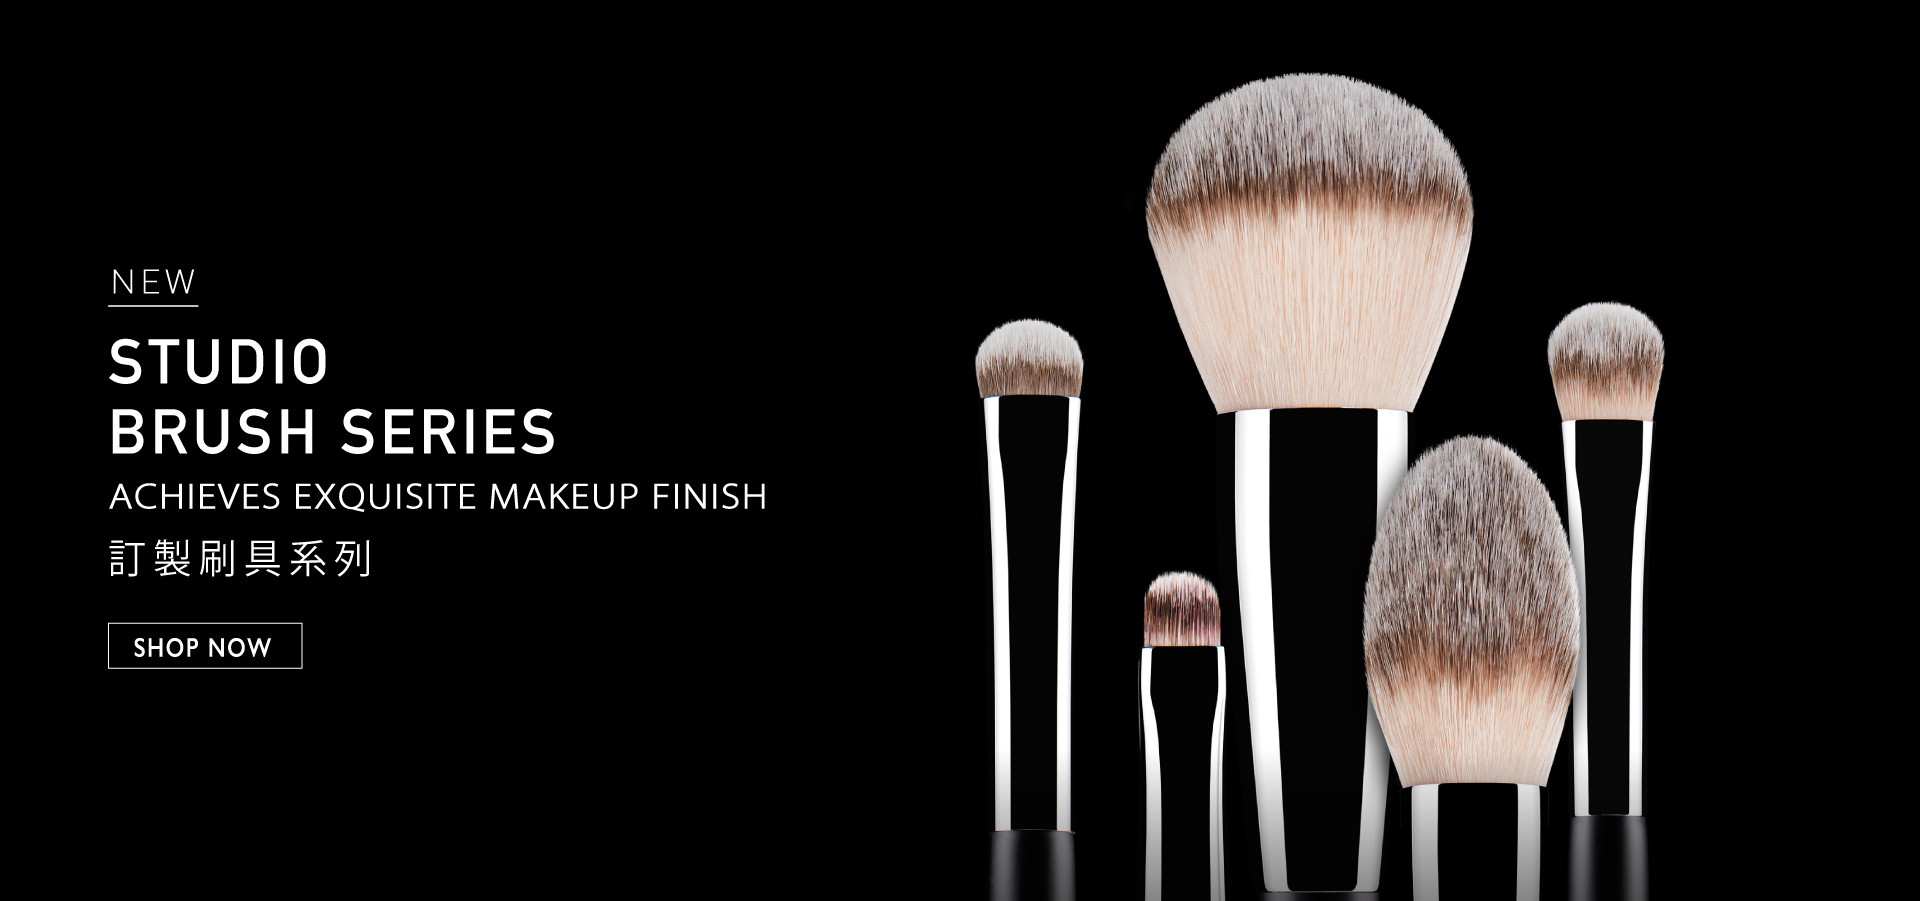 kaibeauty, brush, makeup, studio brush, eye, 刷具, 小凱